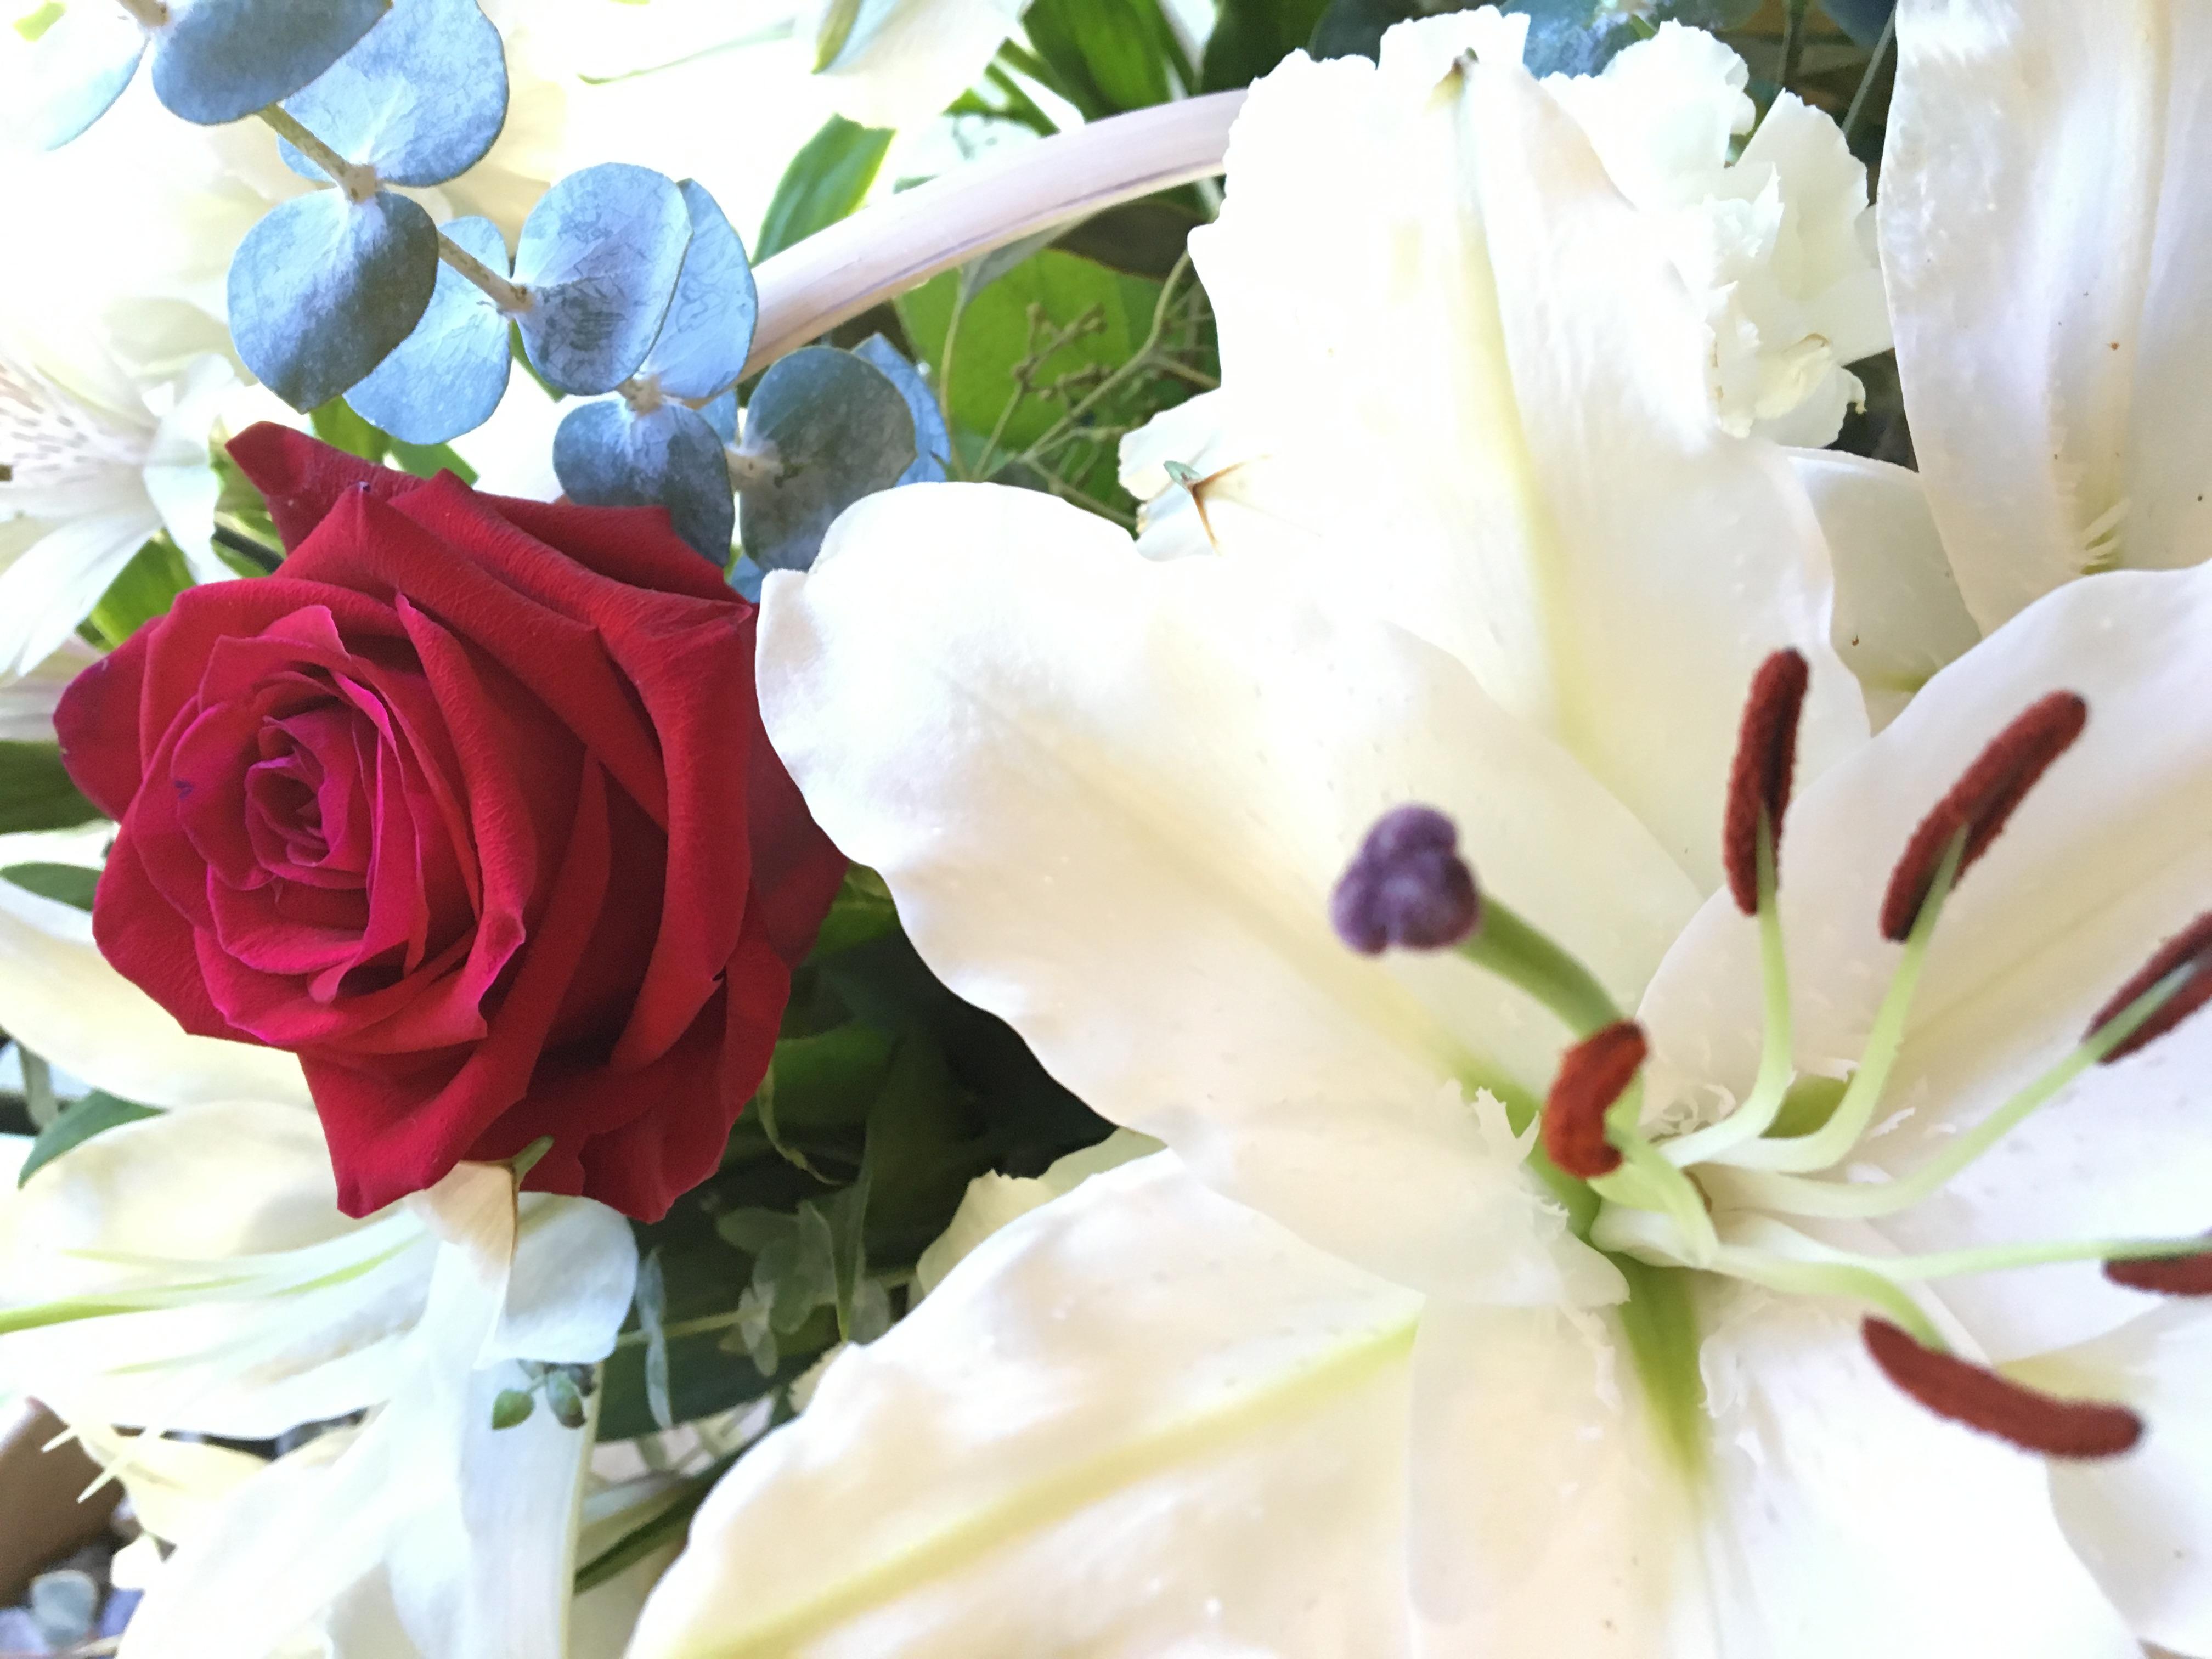 Grieving in Gratitude